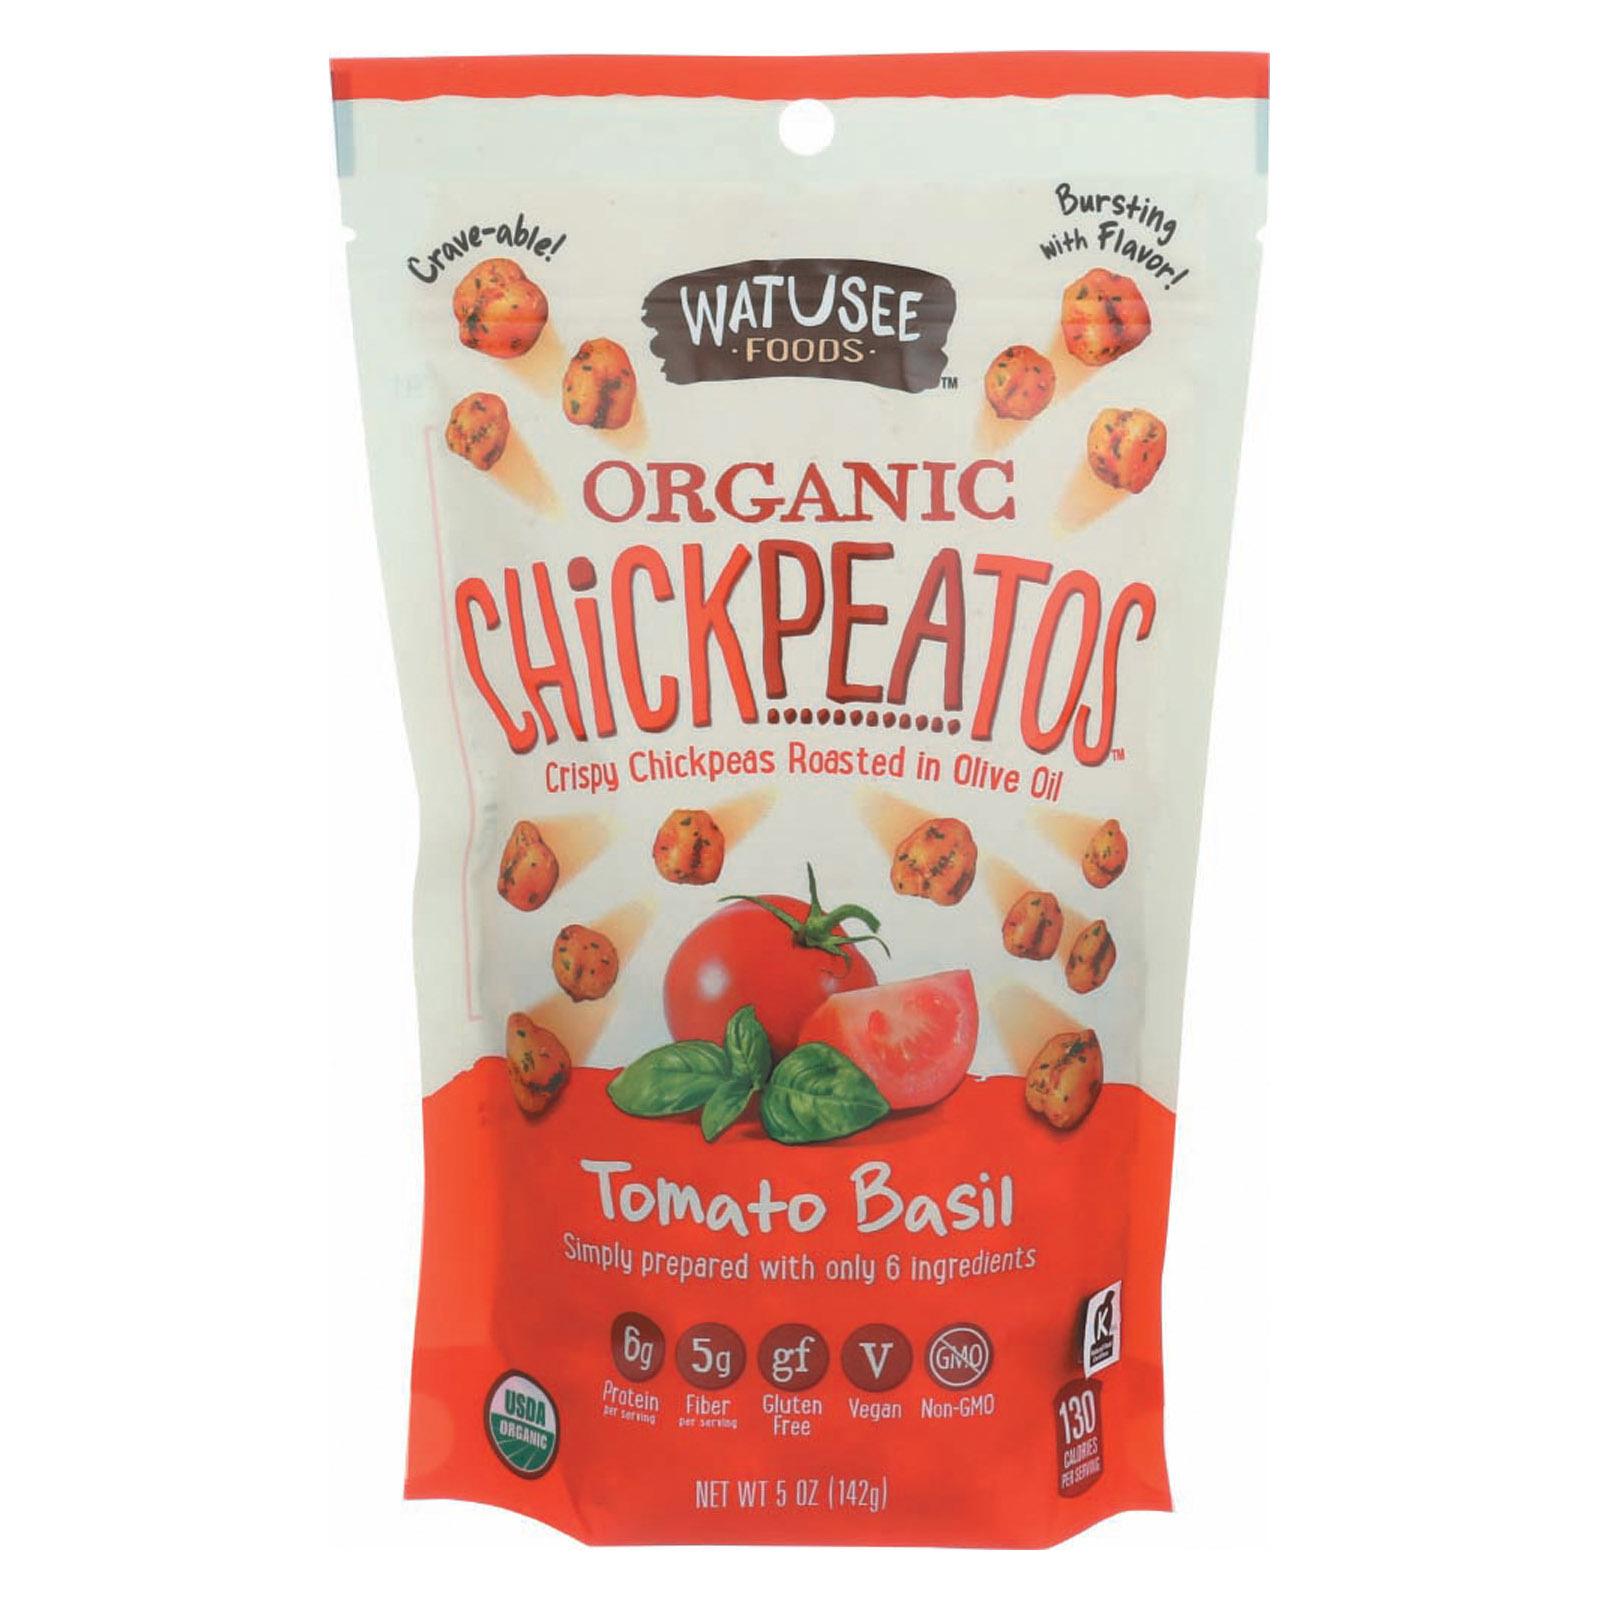 Watusee Foods Organic Chickpeas - Tomato Basil - Case of 12 - 5 oz